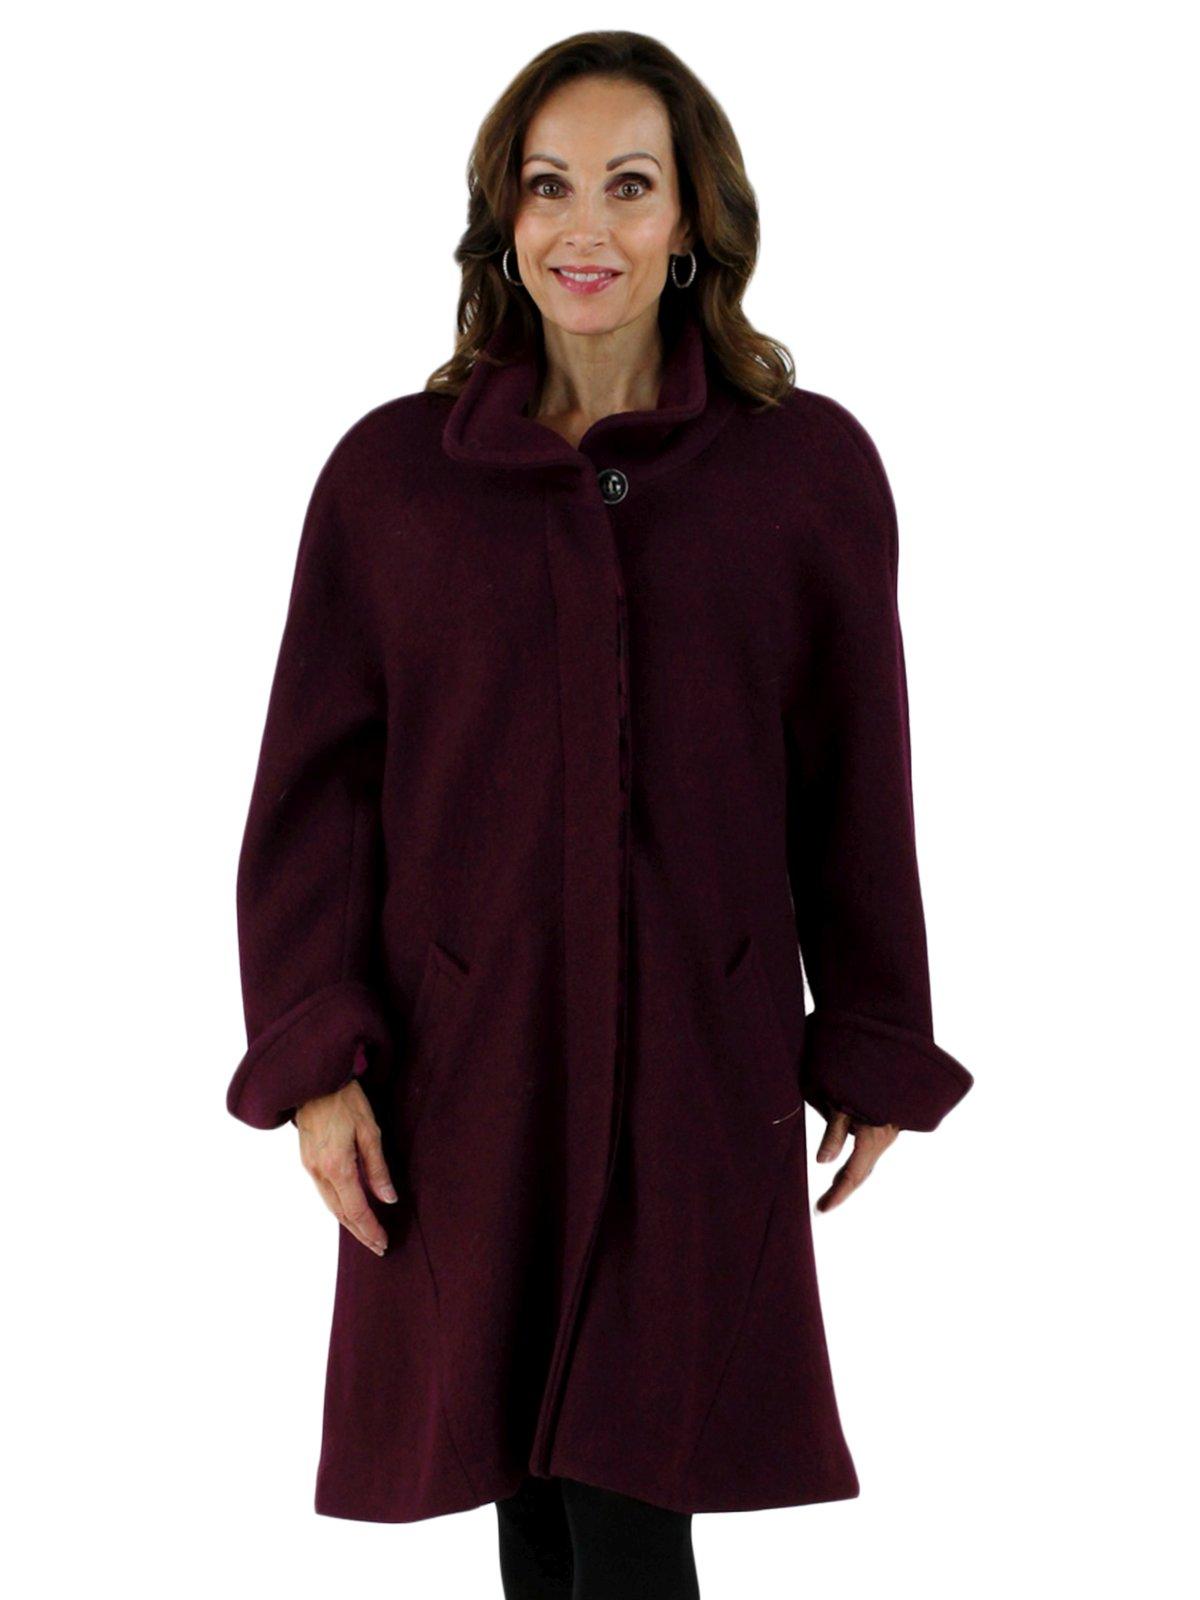 NEW Woman's Wine Cloth Coat